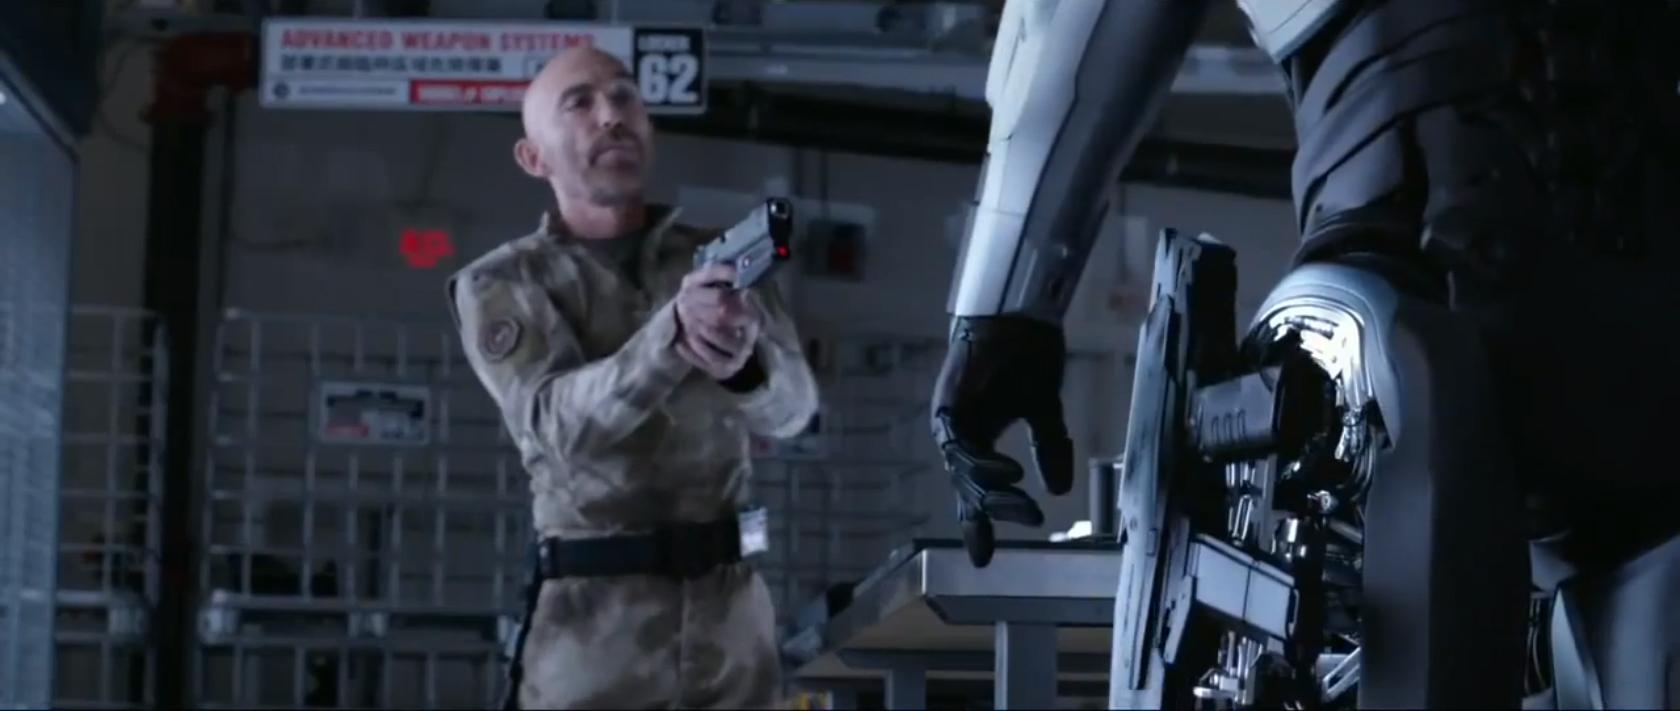 robocop-2014-the-leg-gun.jpg